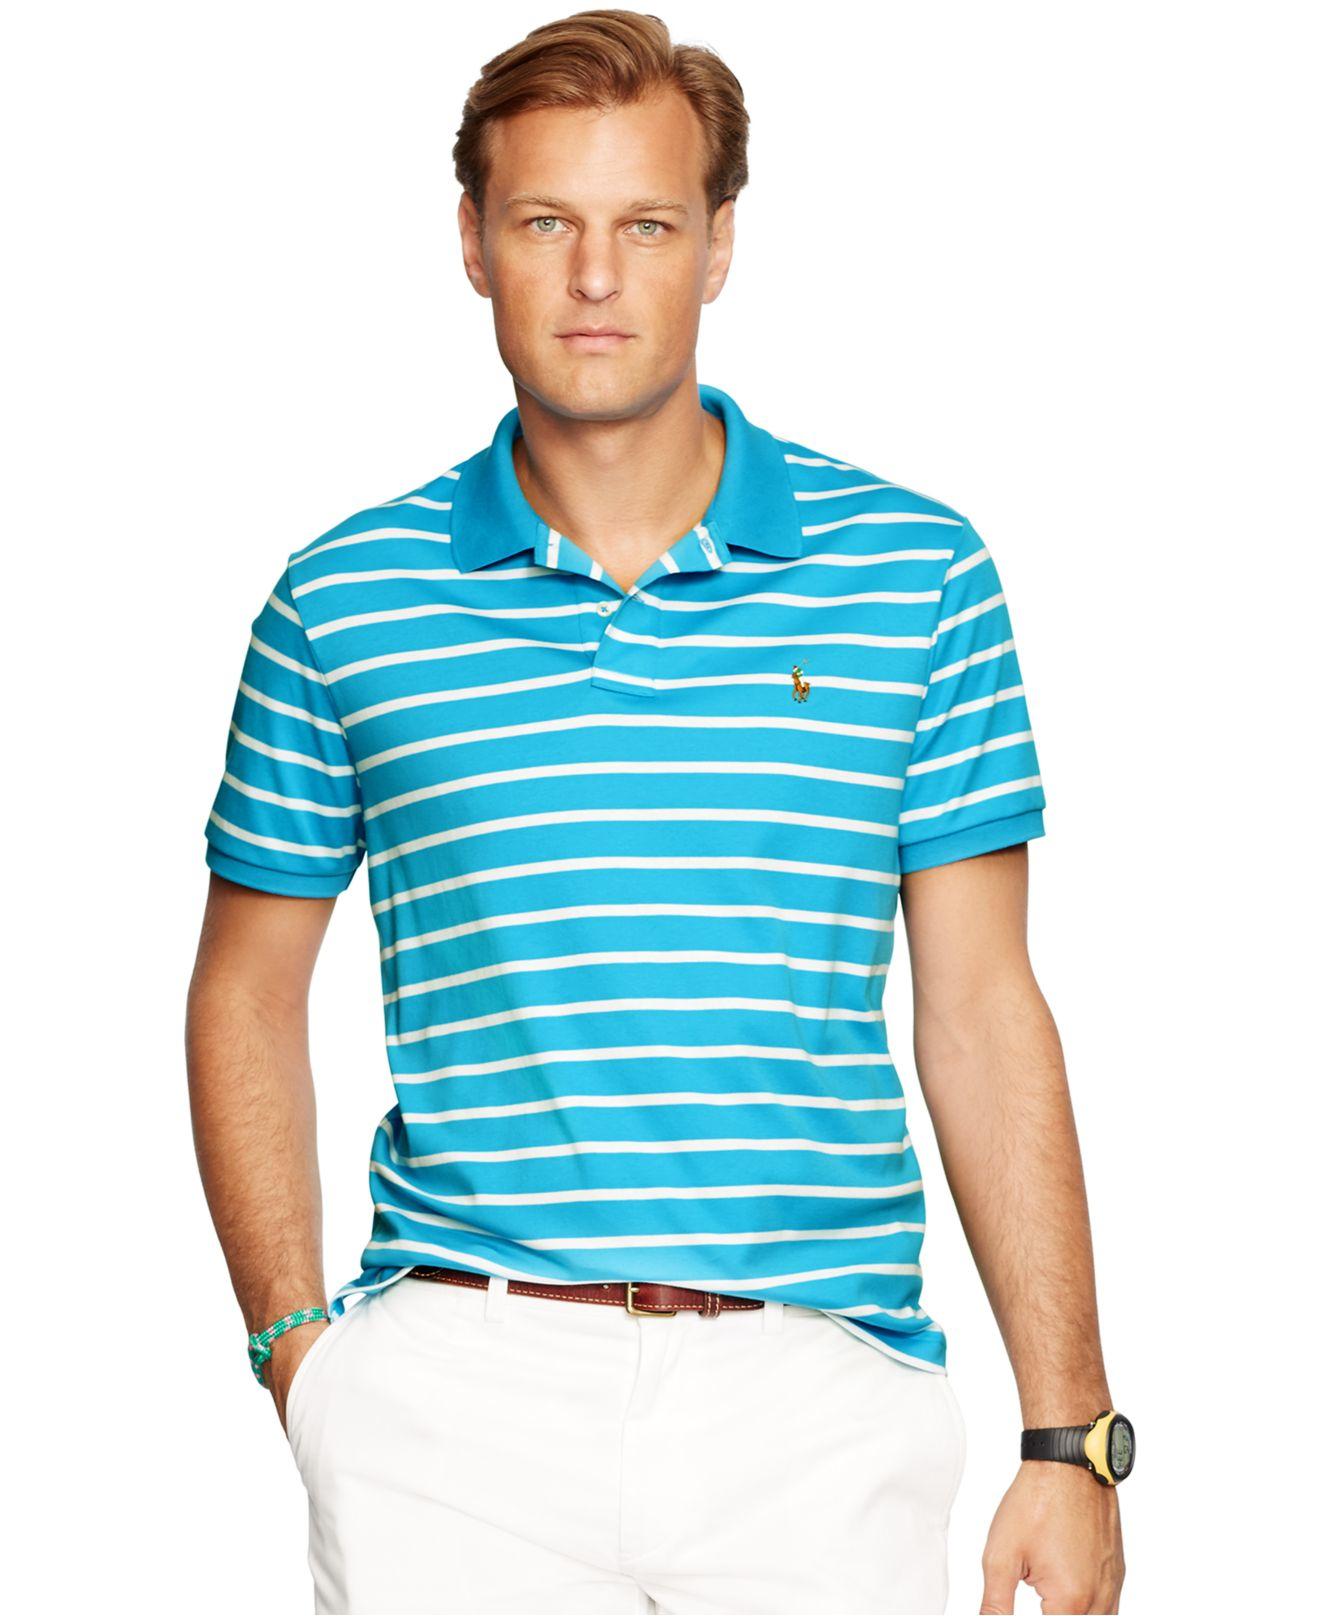 6ec89b81 Polo Ralph Lauren Big & Tall Striped Pima Soft-touch Polo Shirt in ...